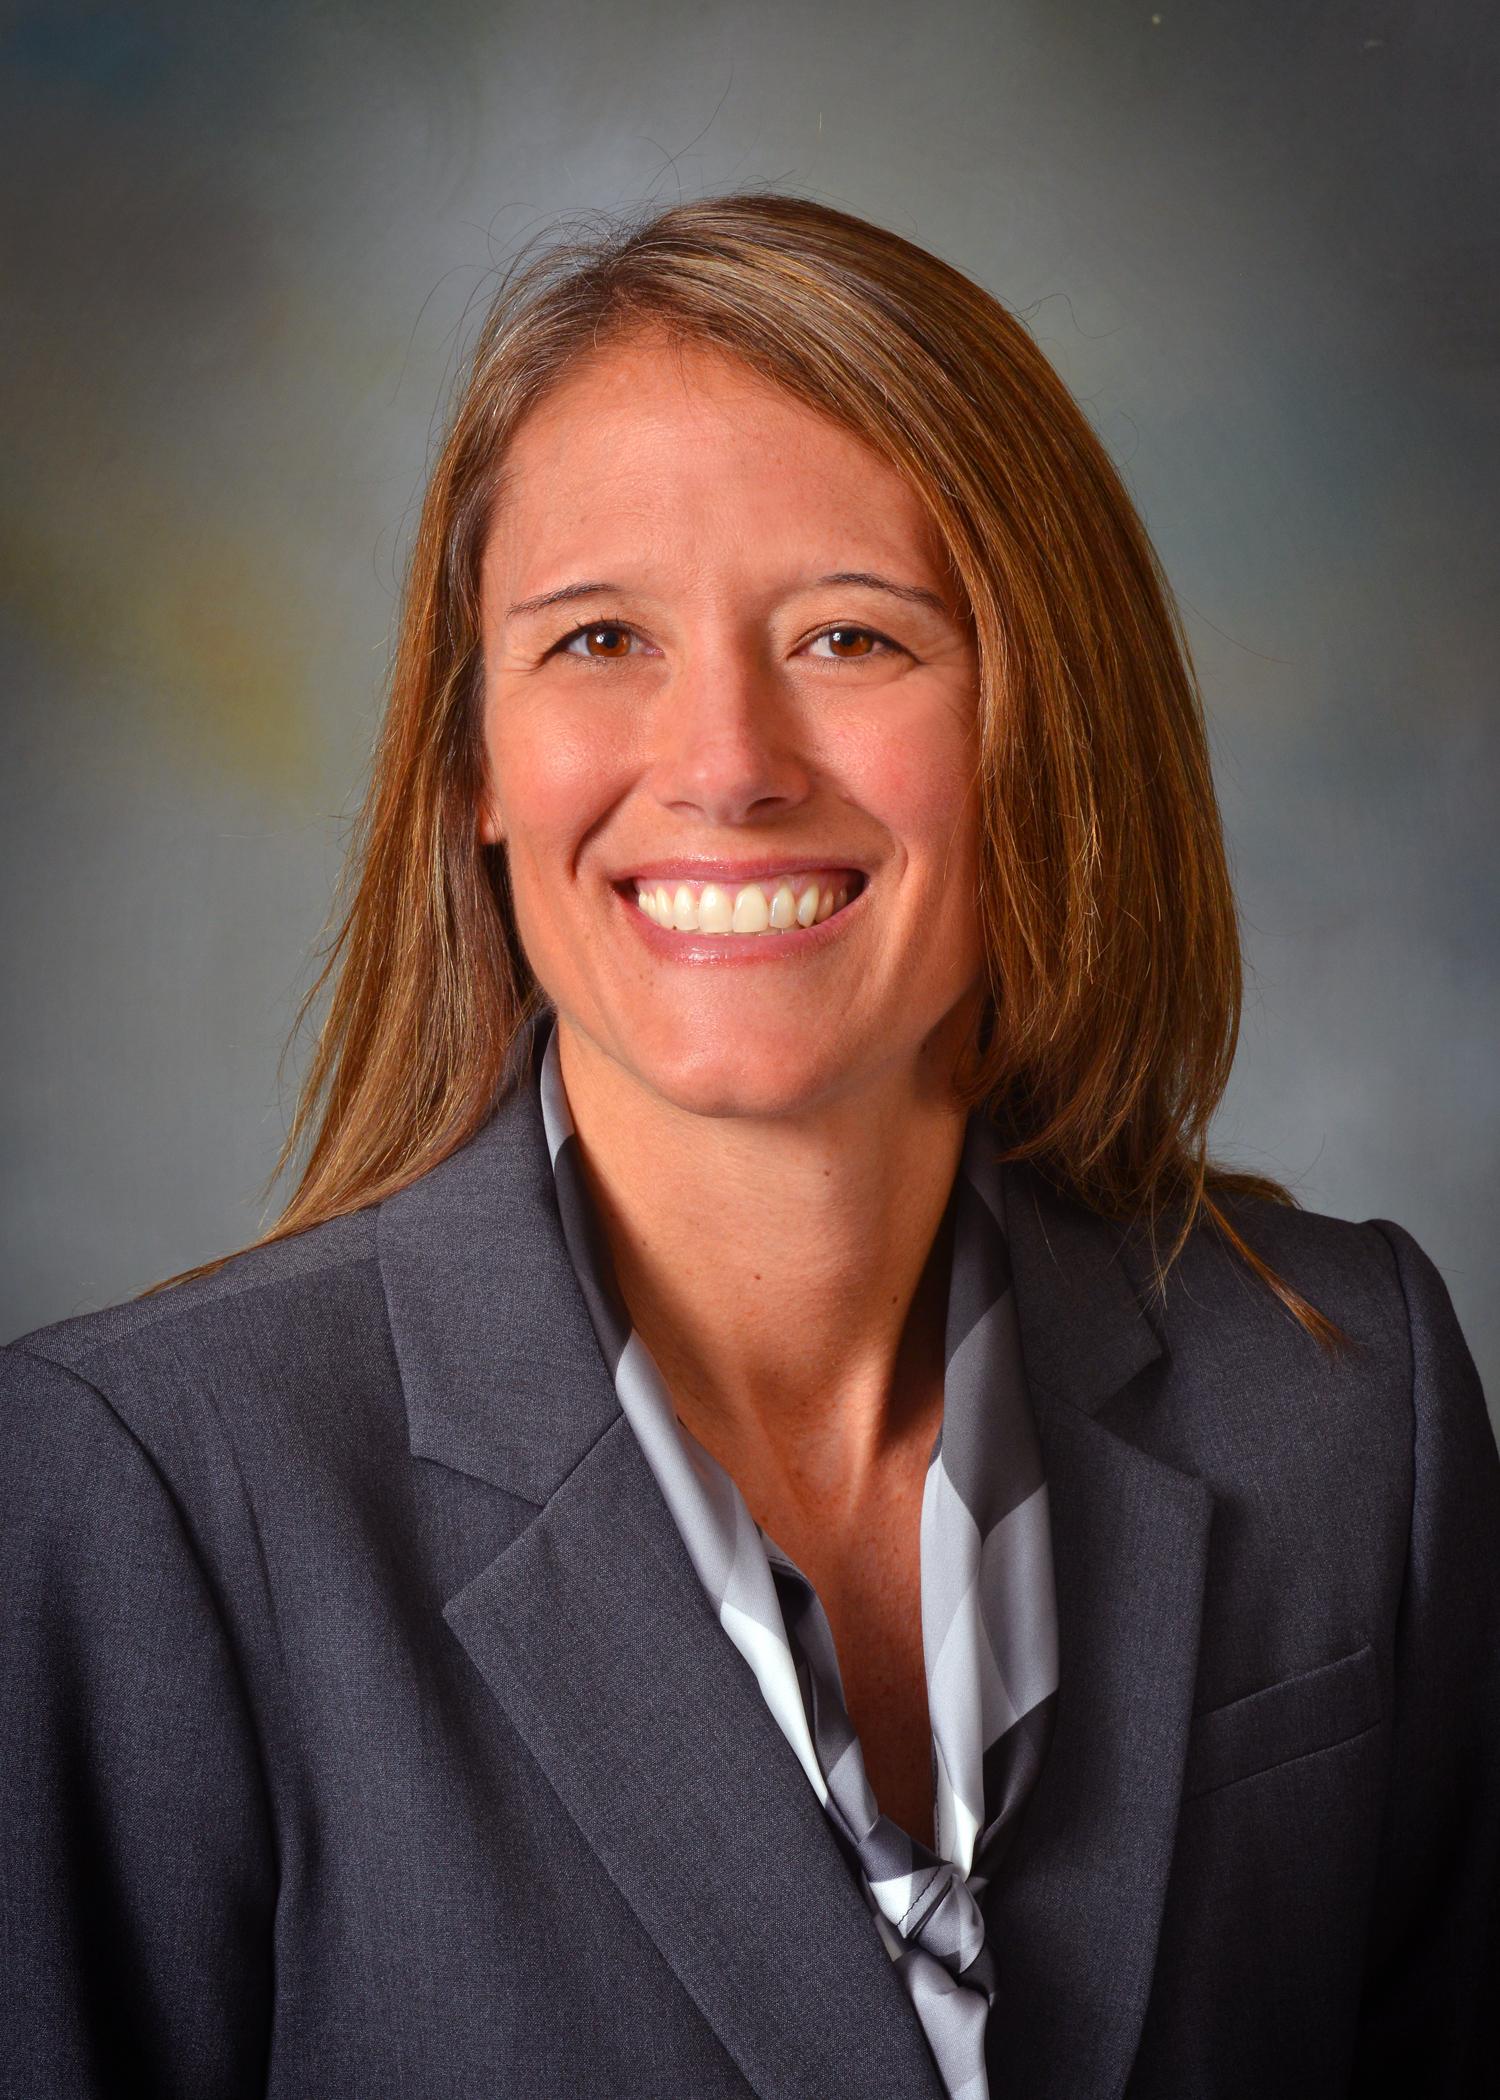 Terri Tchorzynski, a school counselor at Calhoun Area Career Center in Battle Creek, Mich.